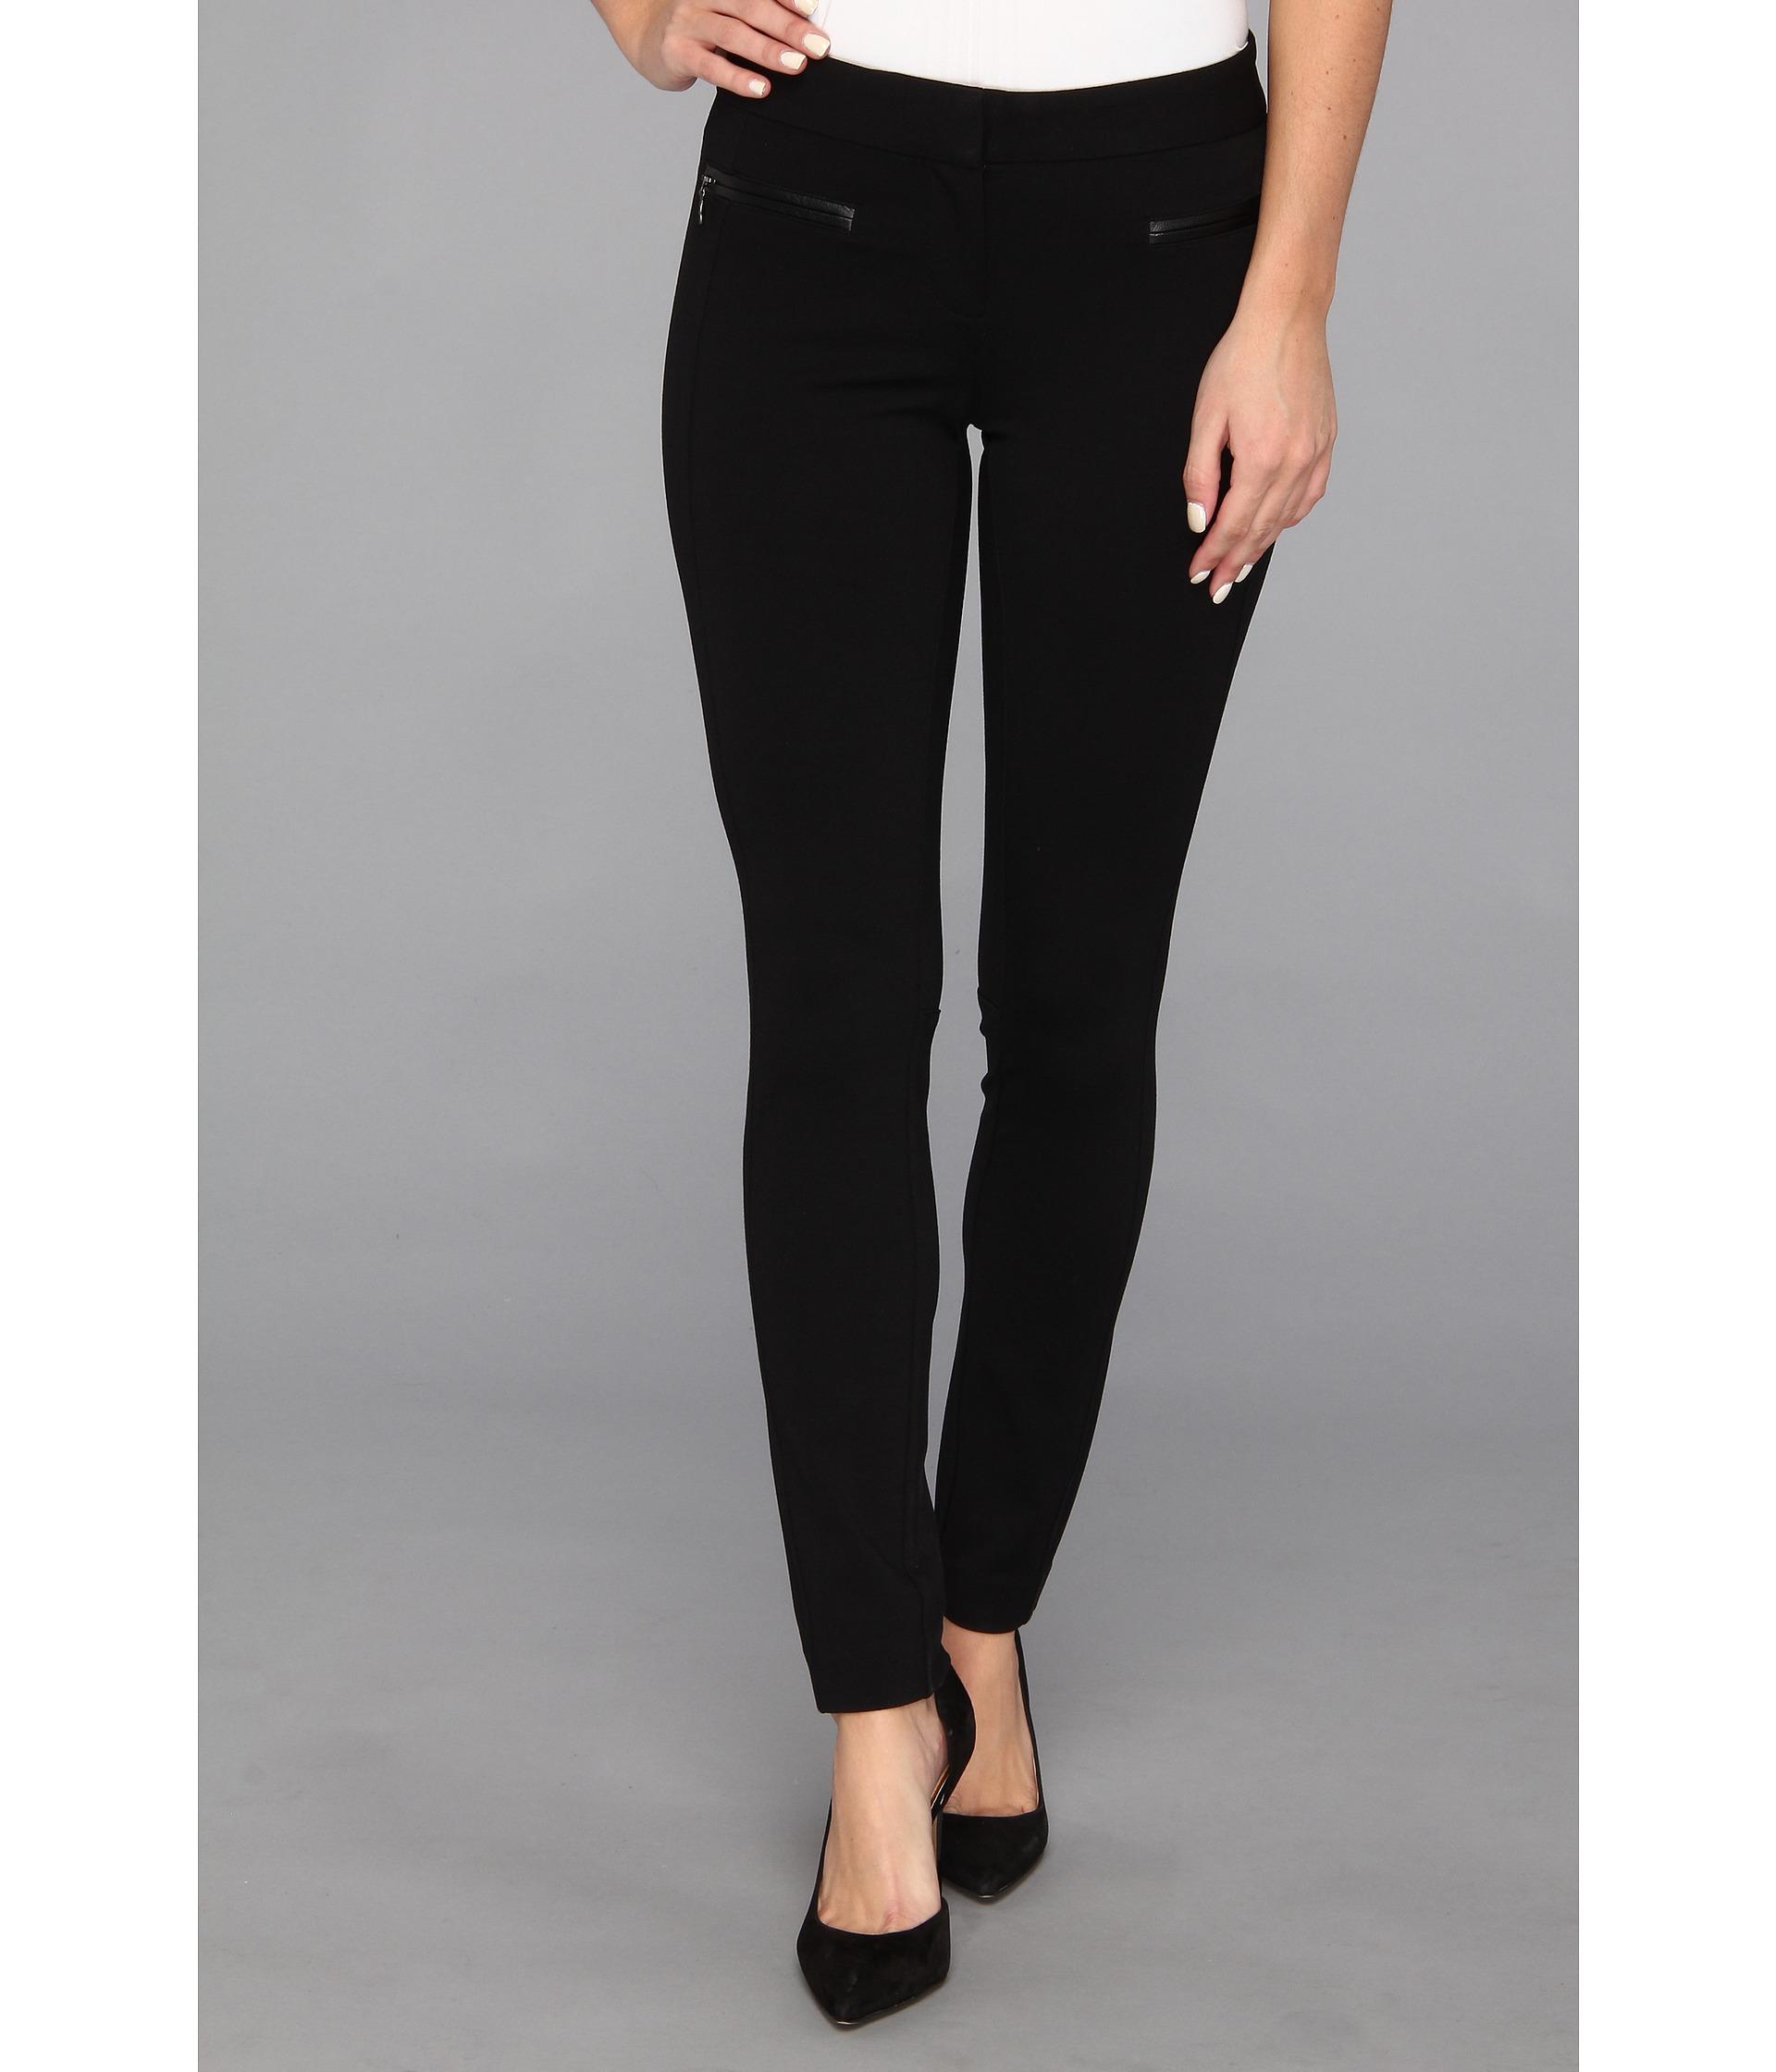 Paige Los Feliz Skinny Pant in Black Black - 6pm.com